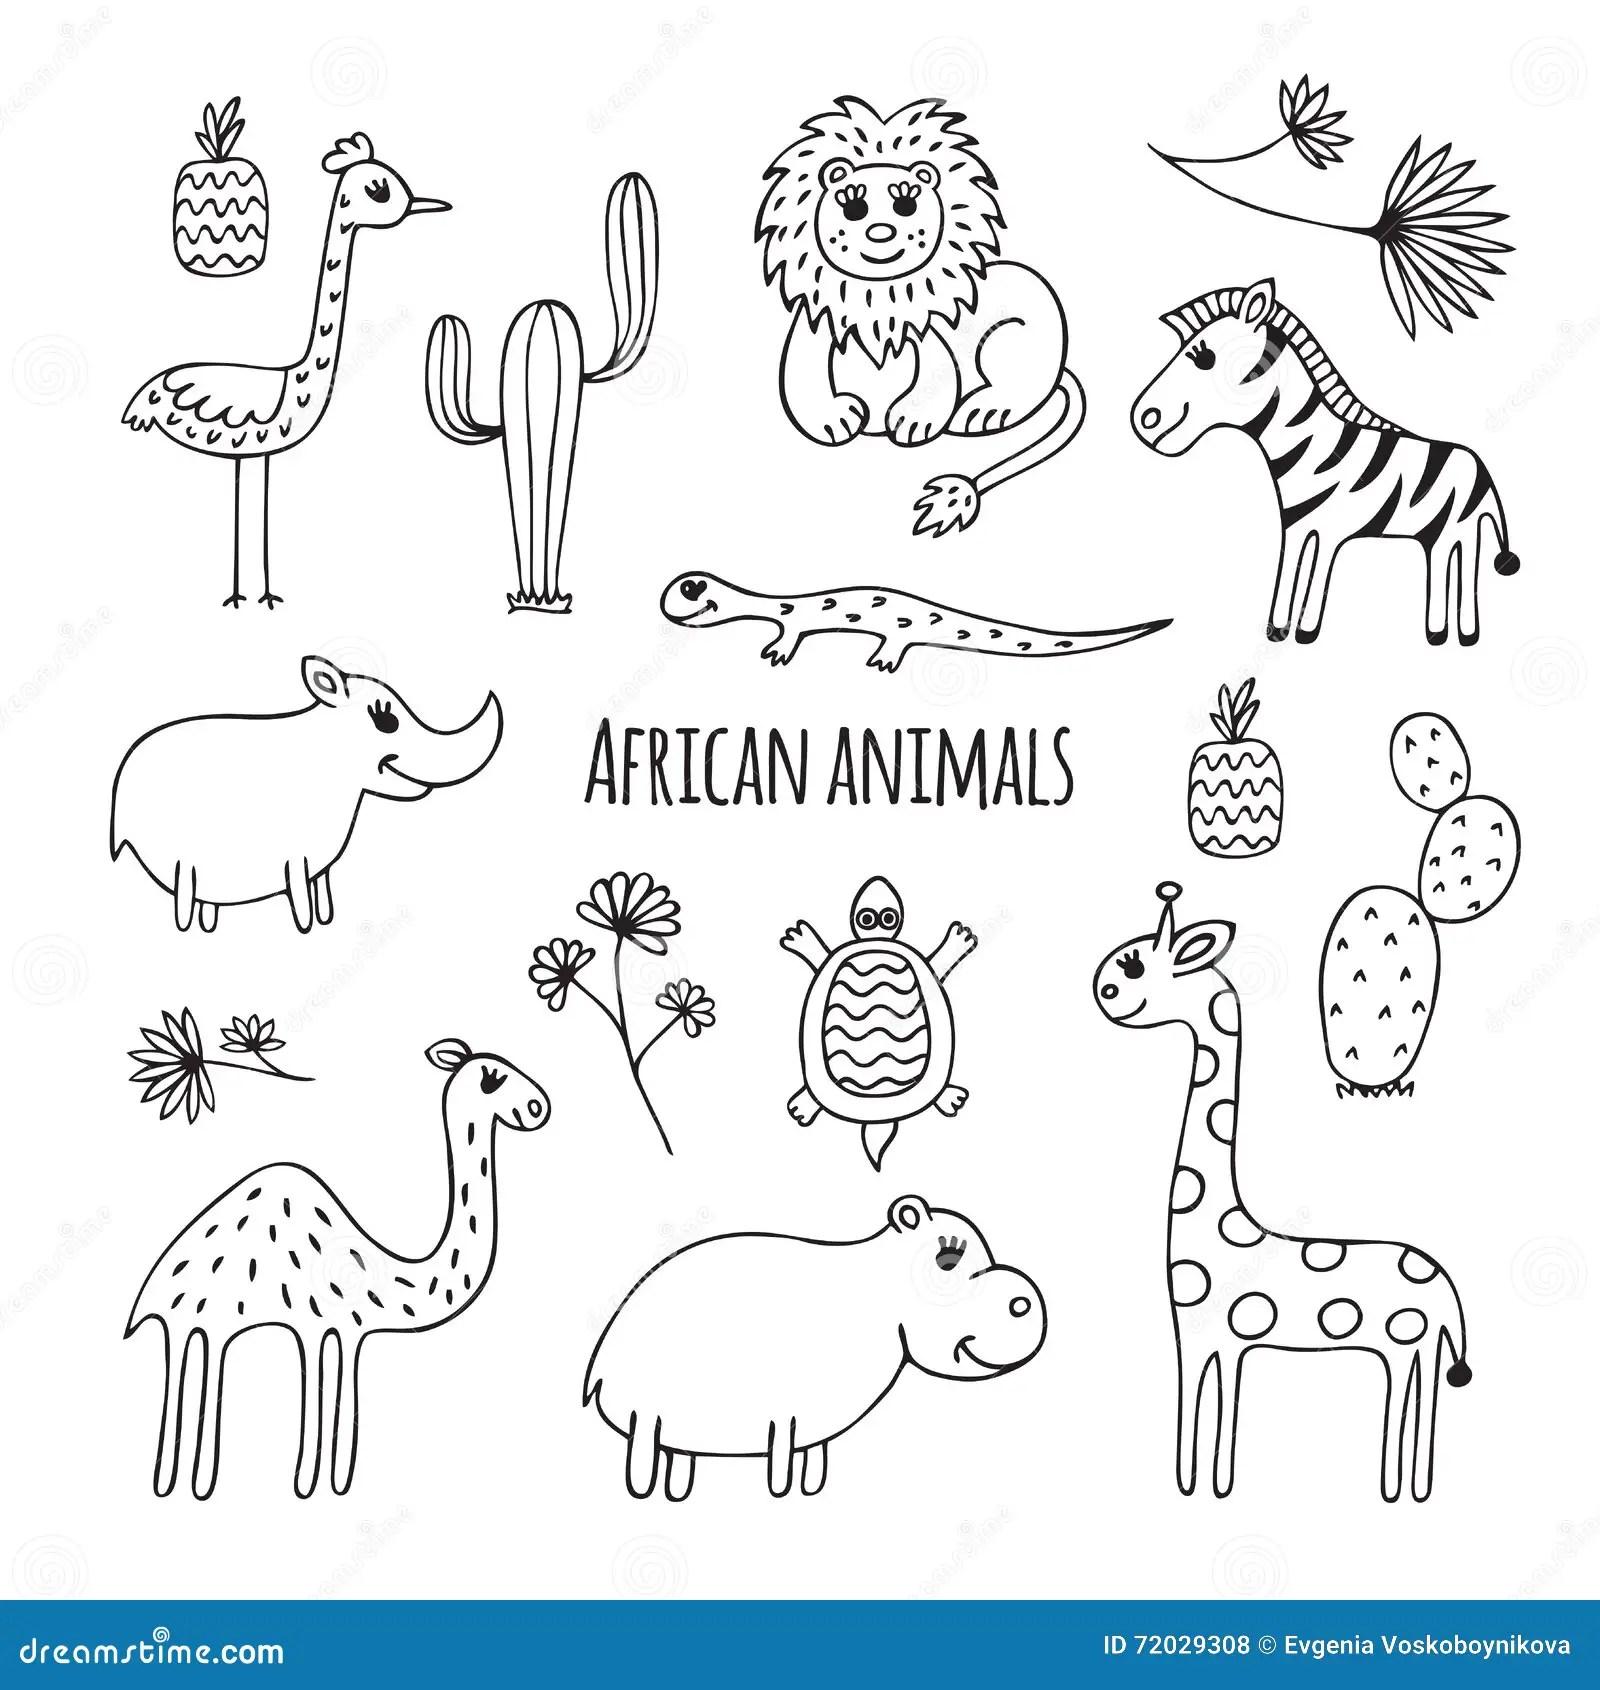 African Desert Animals Worksheet